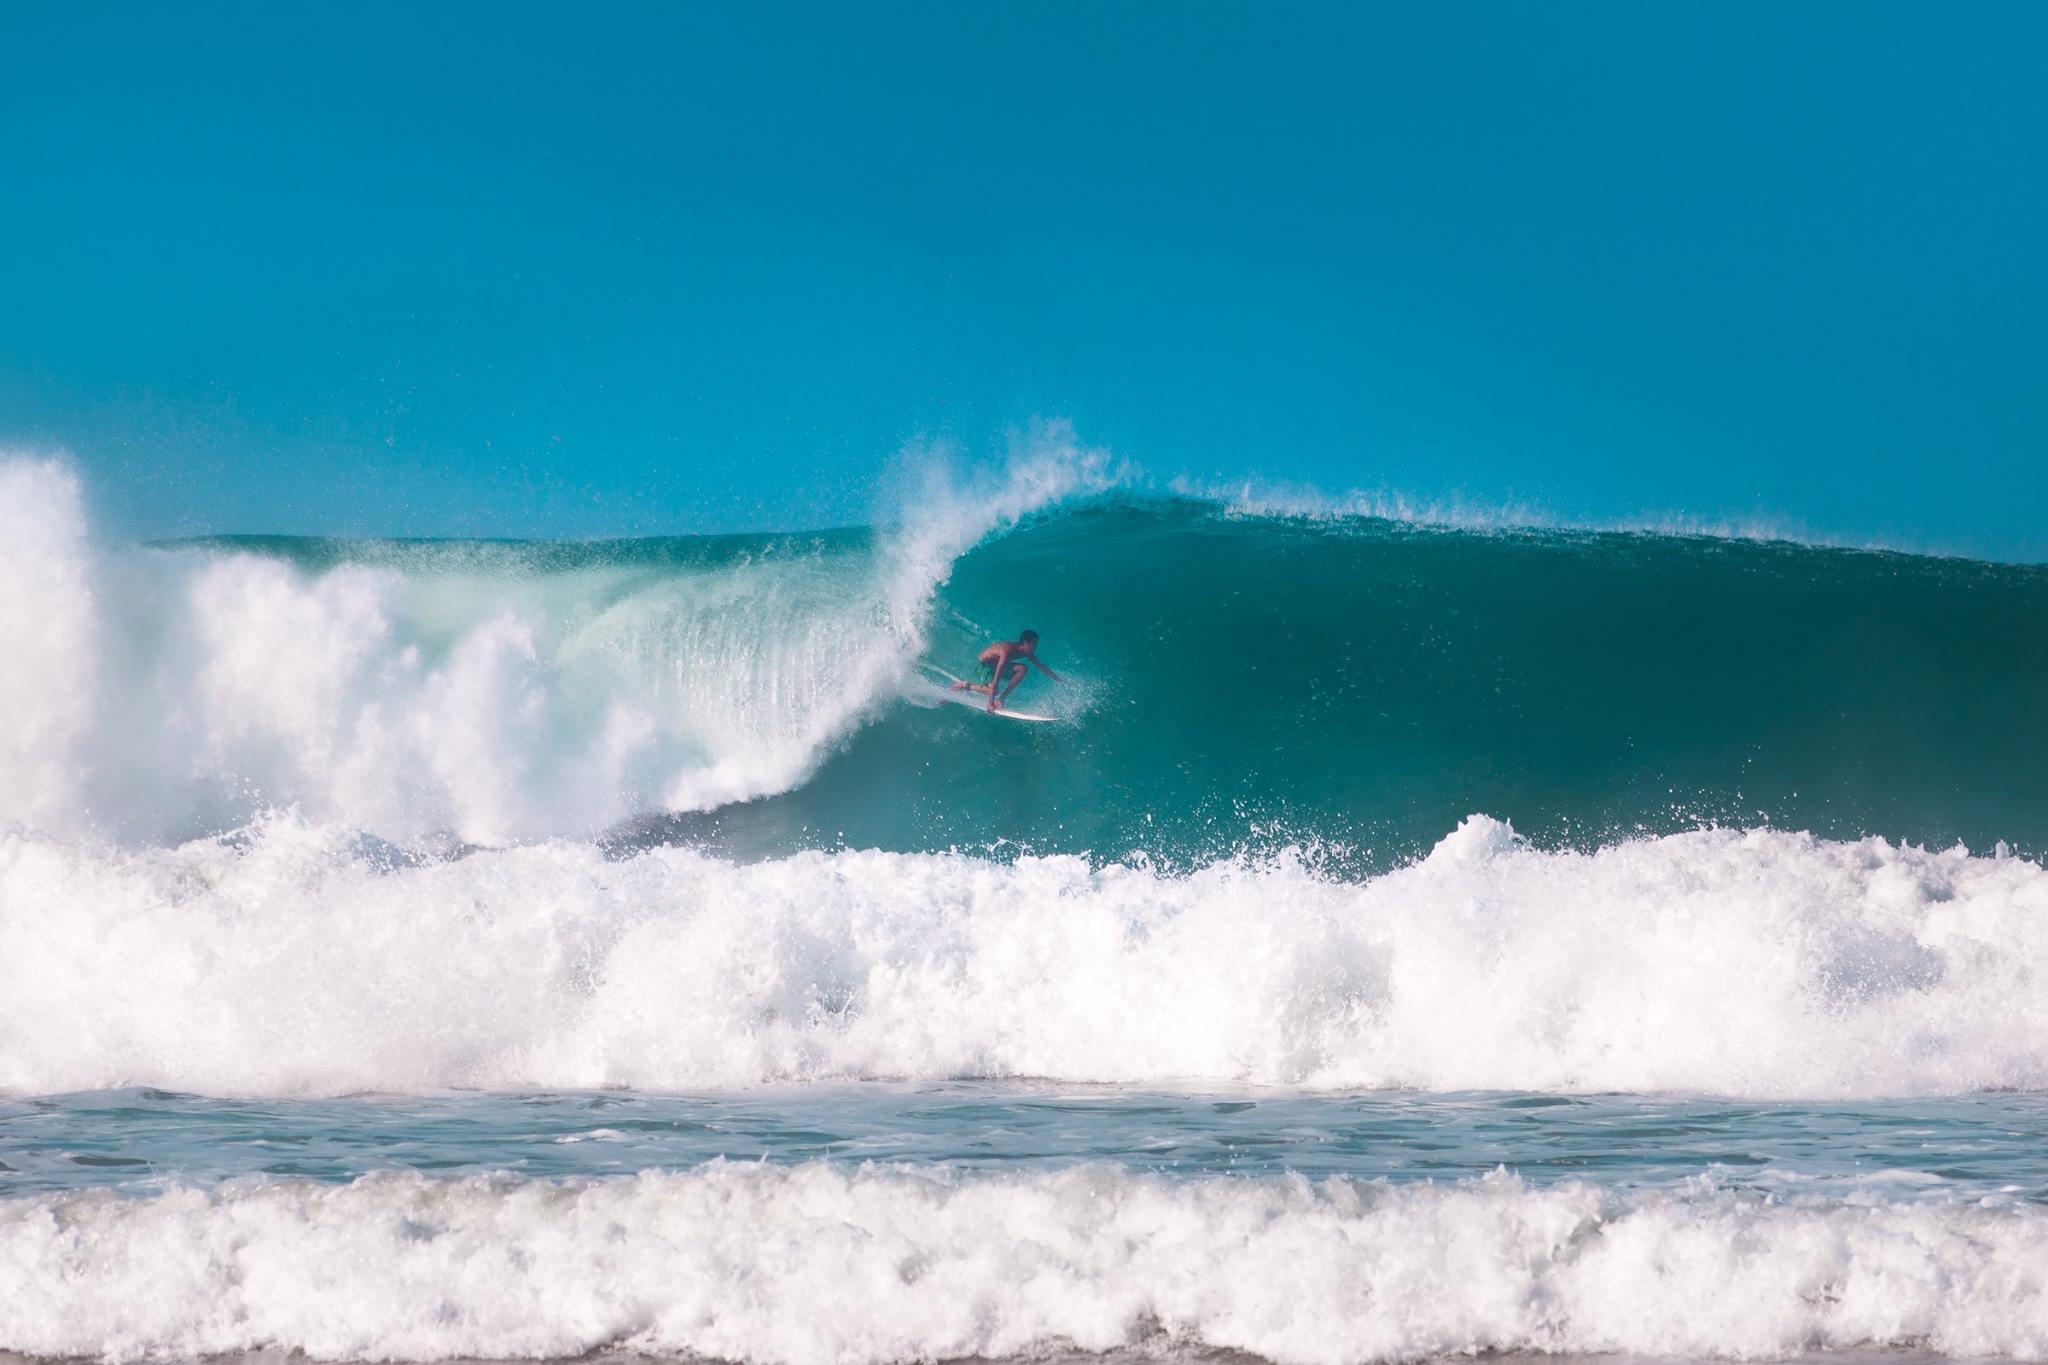 Playa HermosaCosta Rica -